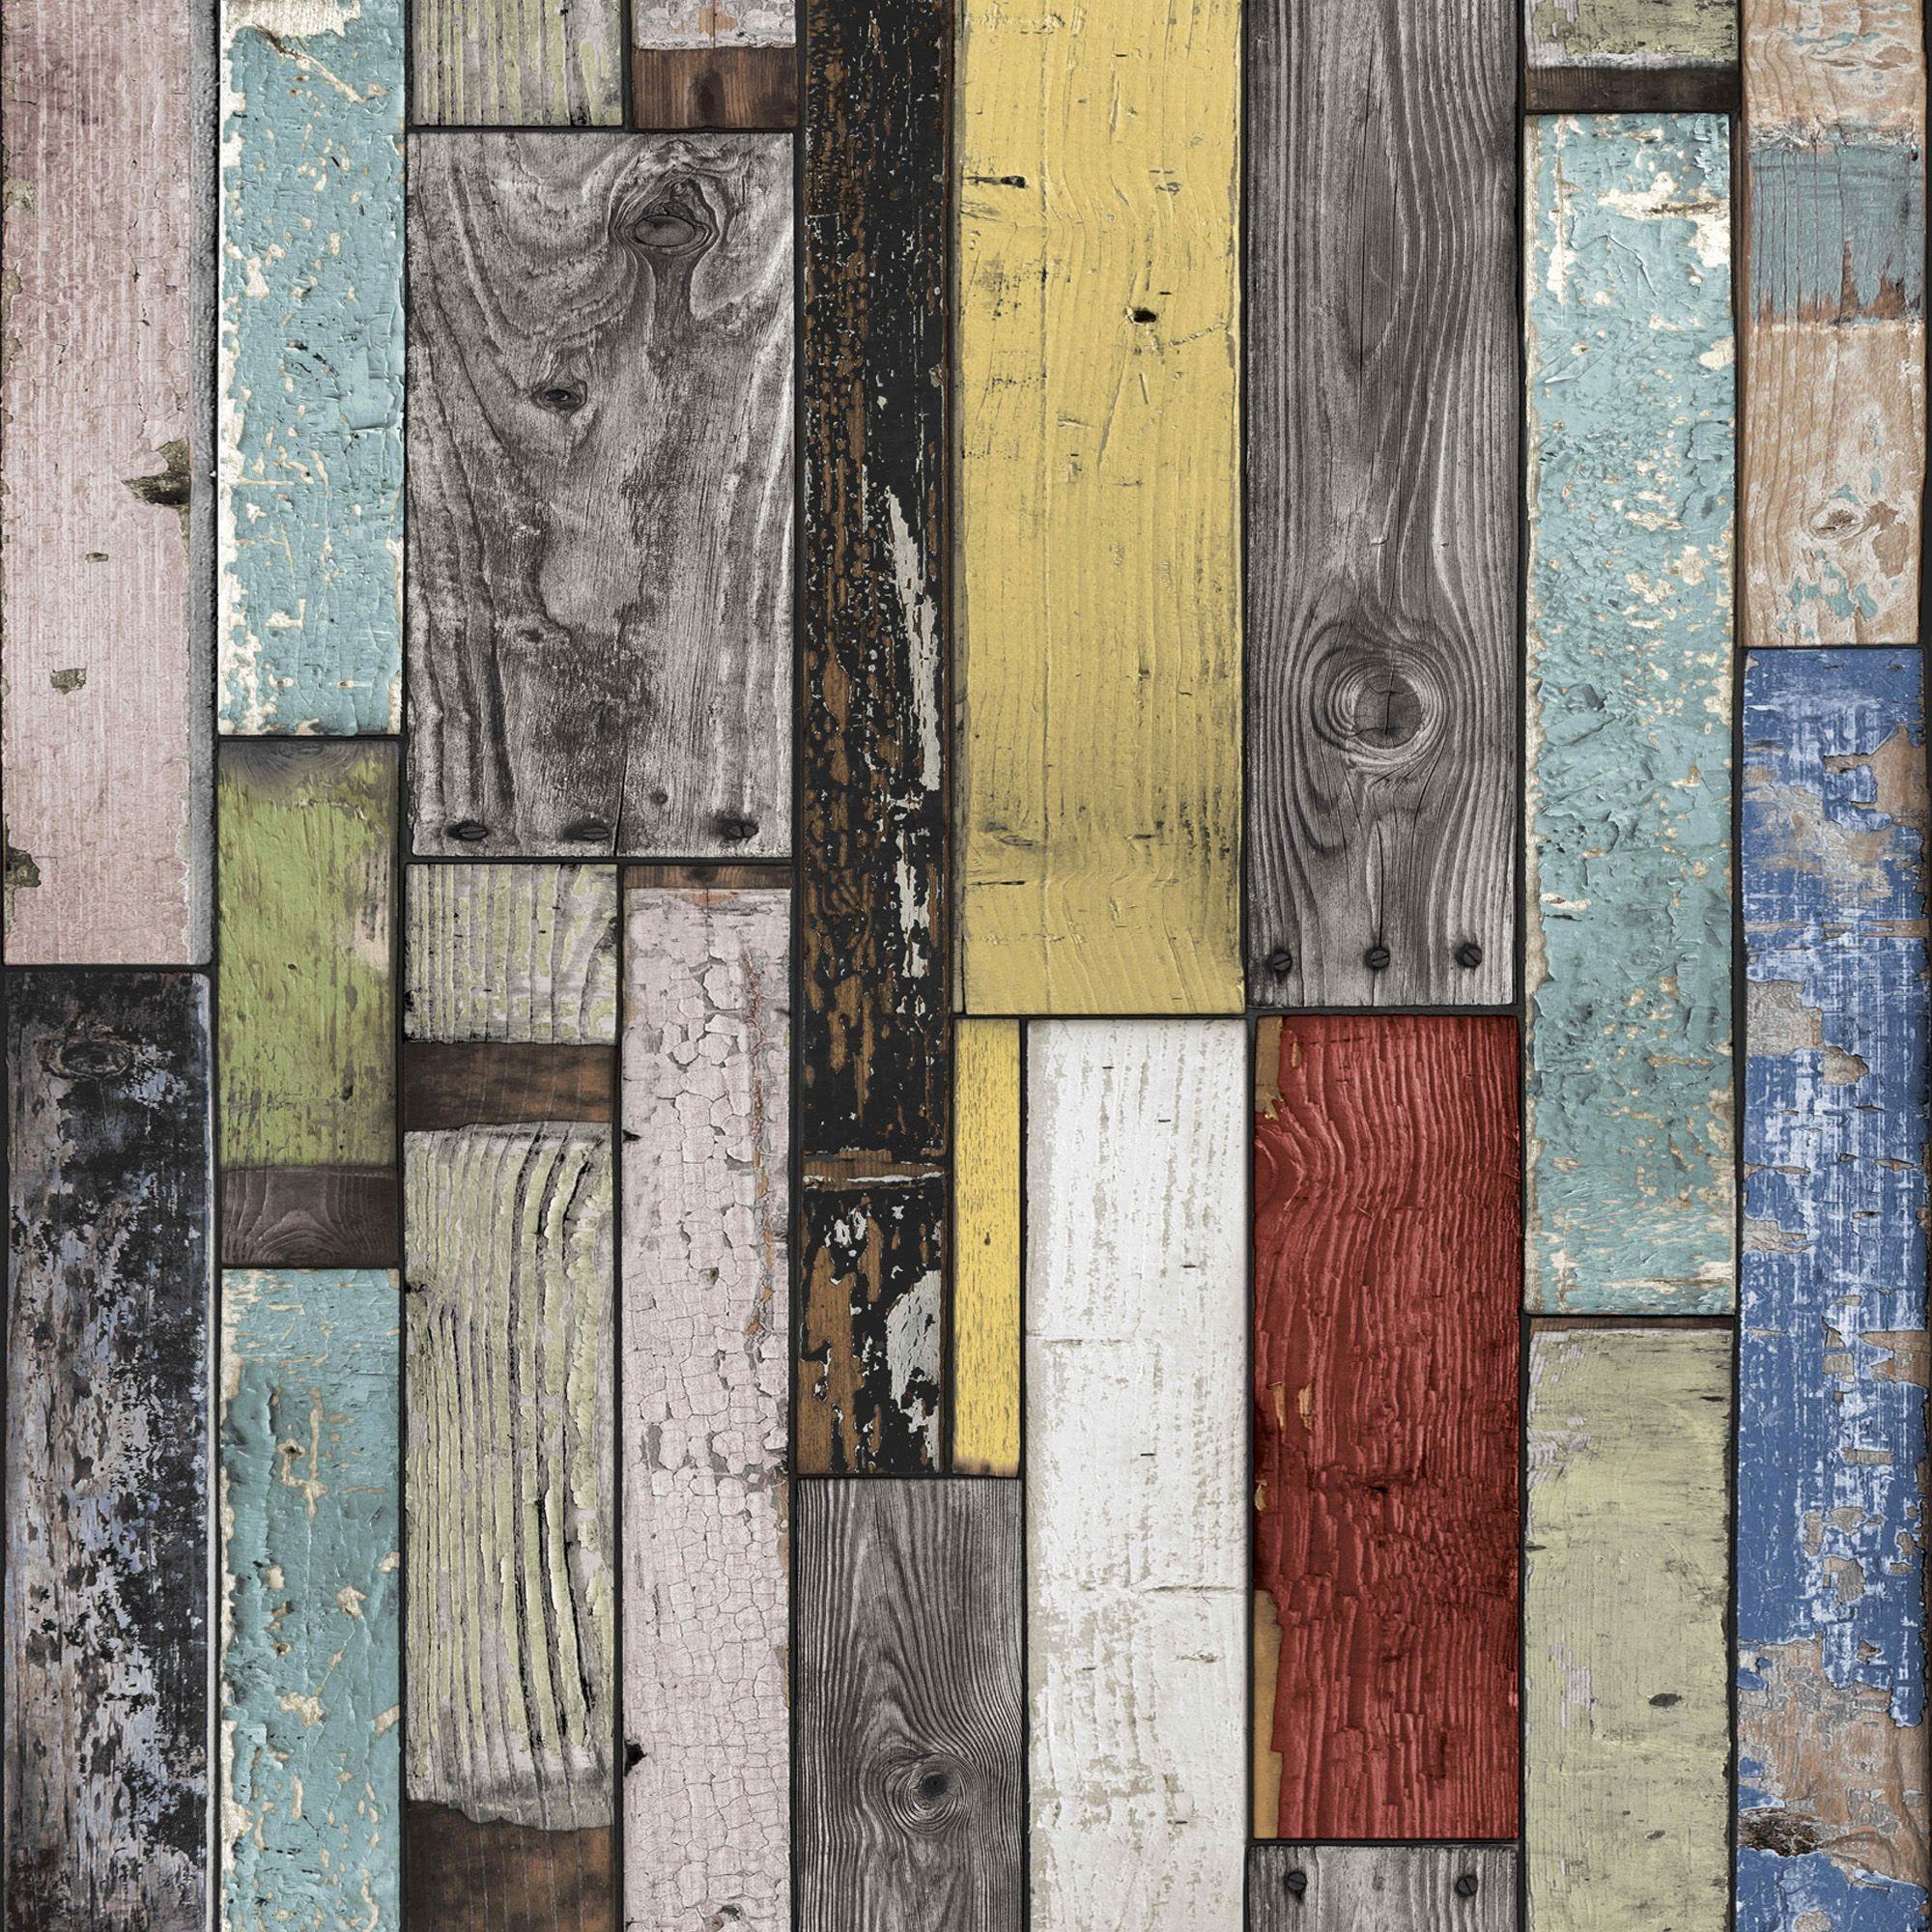 Classic 3d Desktop Workplace Wallpaper Painted Wooden Planks Wallpaper Departments Diy At B Amp Q